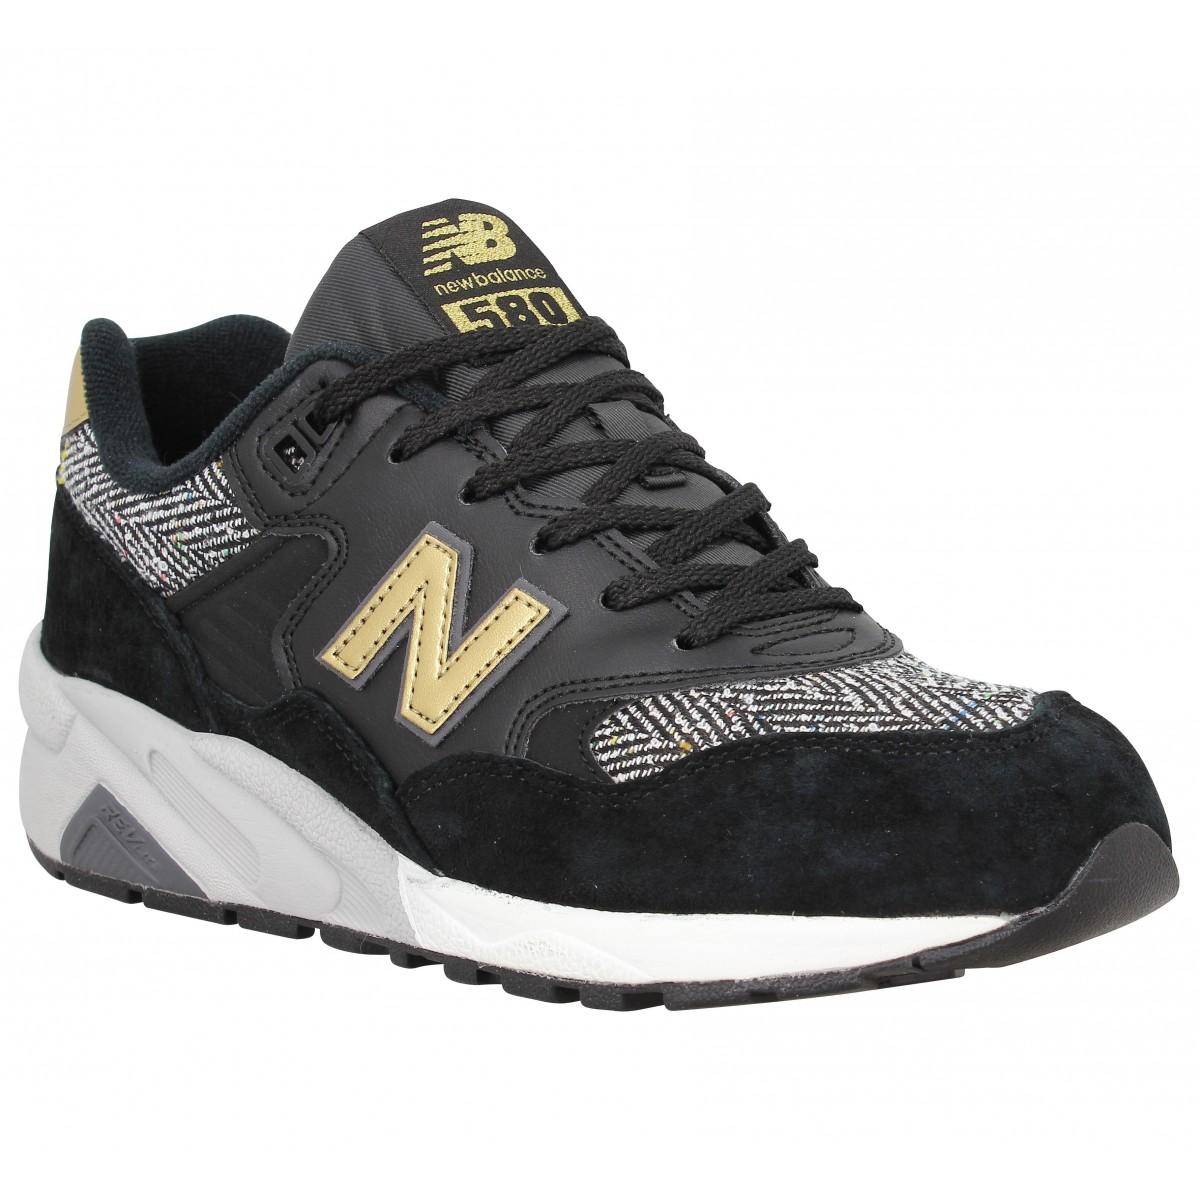 New Balance Marque 580-36-noir